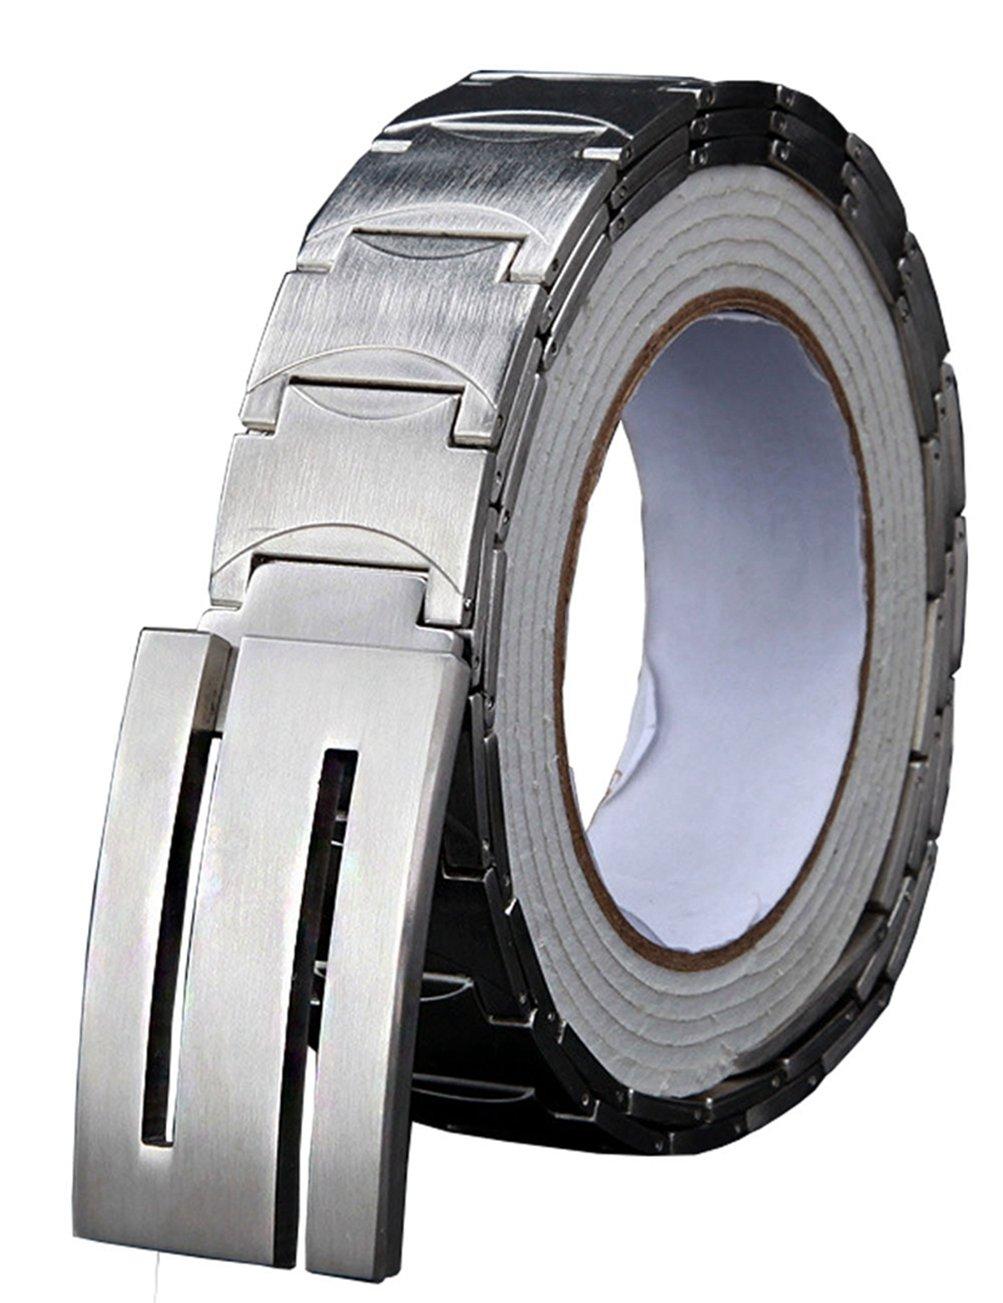 Menschwear Men's Stainless Steel Belt Slide Buckle Adjustable 32mm 155 Silver 110cm